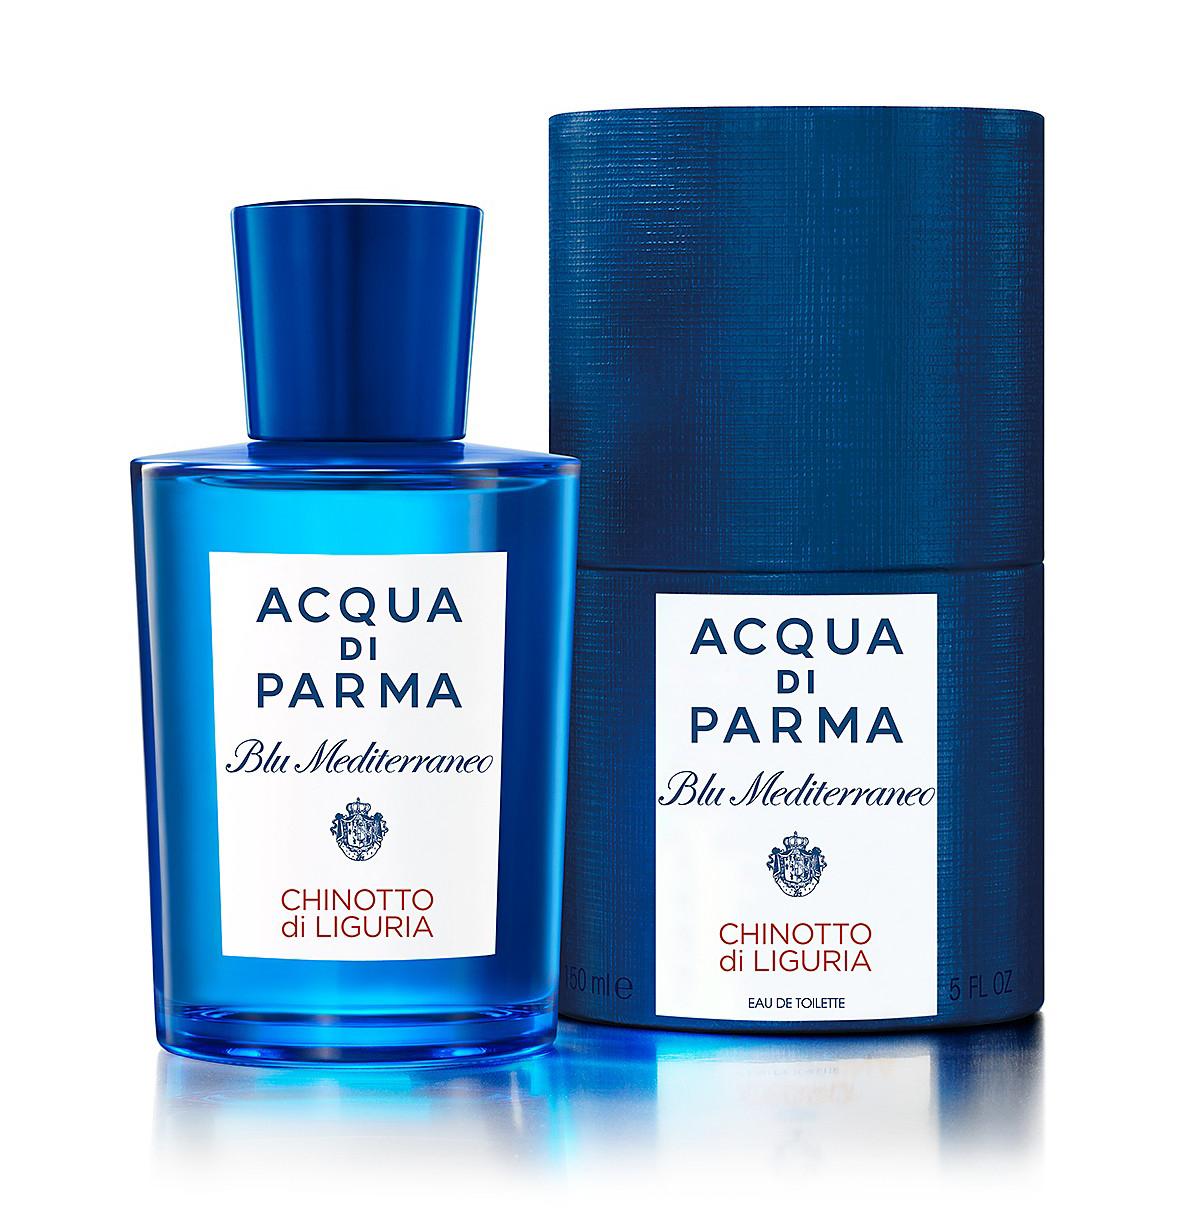 Chinotto di Liguria Acqua di Parma аромат - новий аромат для жінок ... 1962be45a1f2d